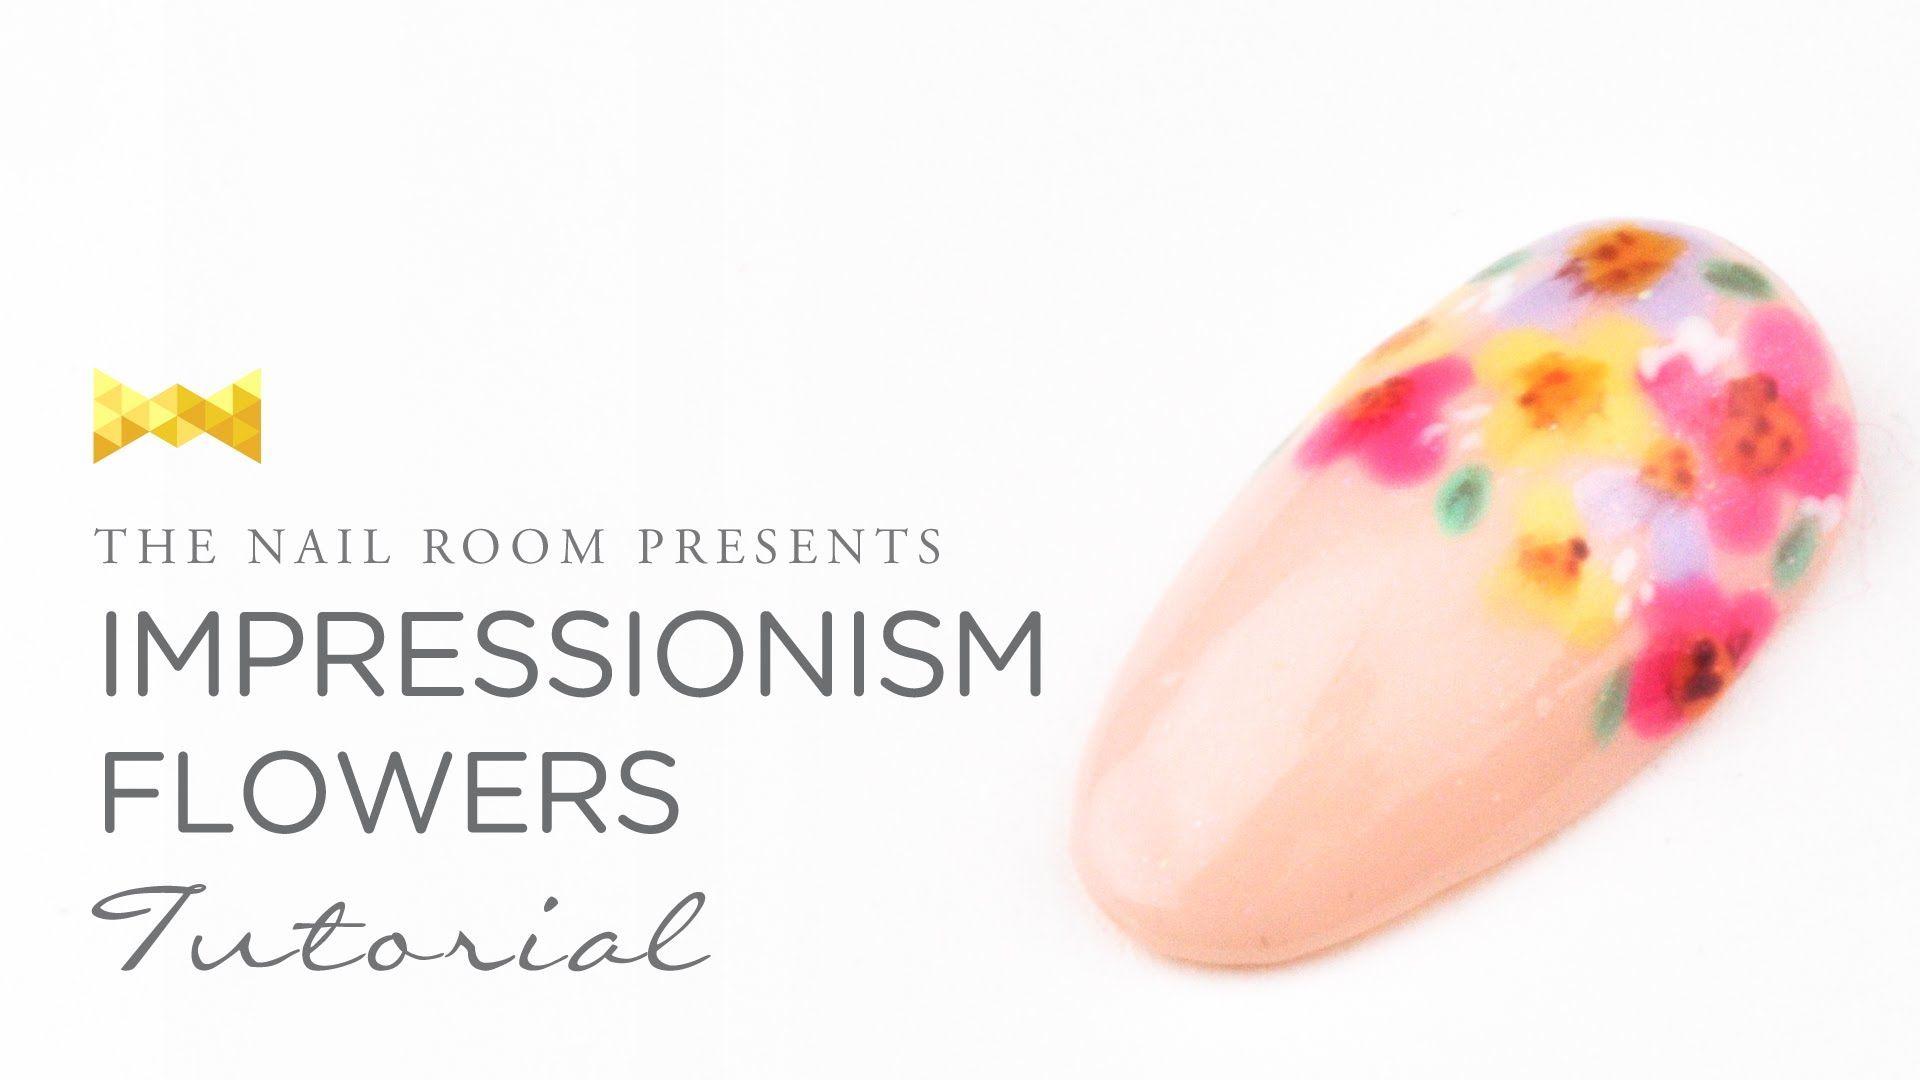 Impressionism Flowers Nail Art - Japanese Nail Art Tutorial [HD]